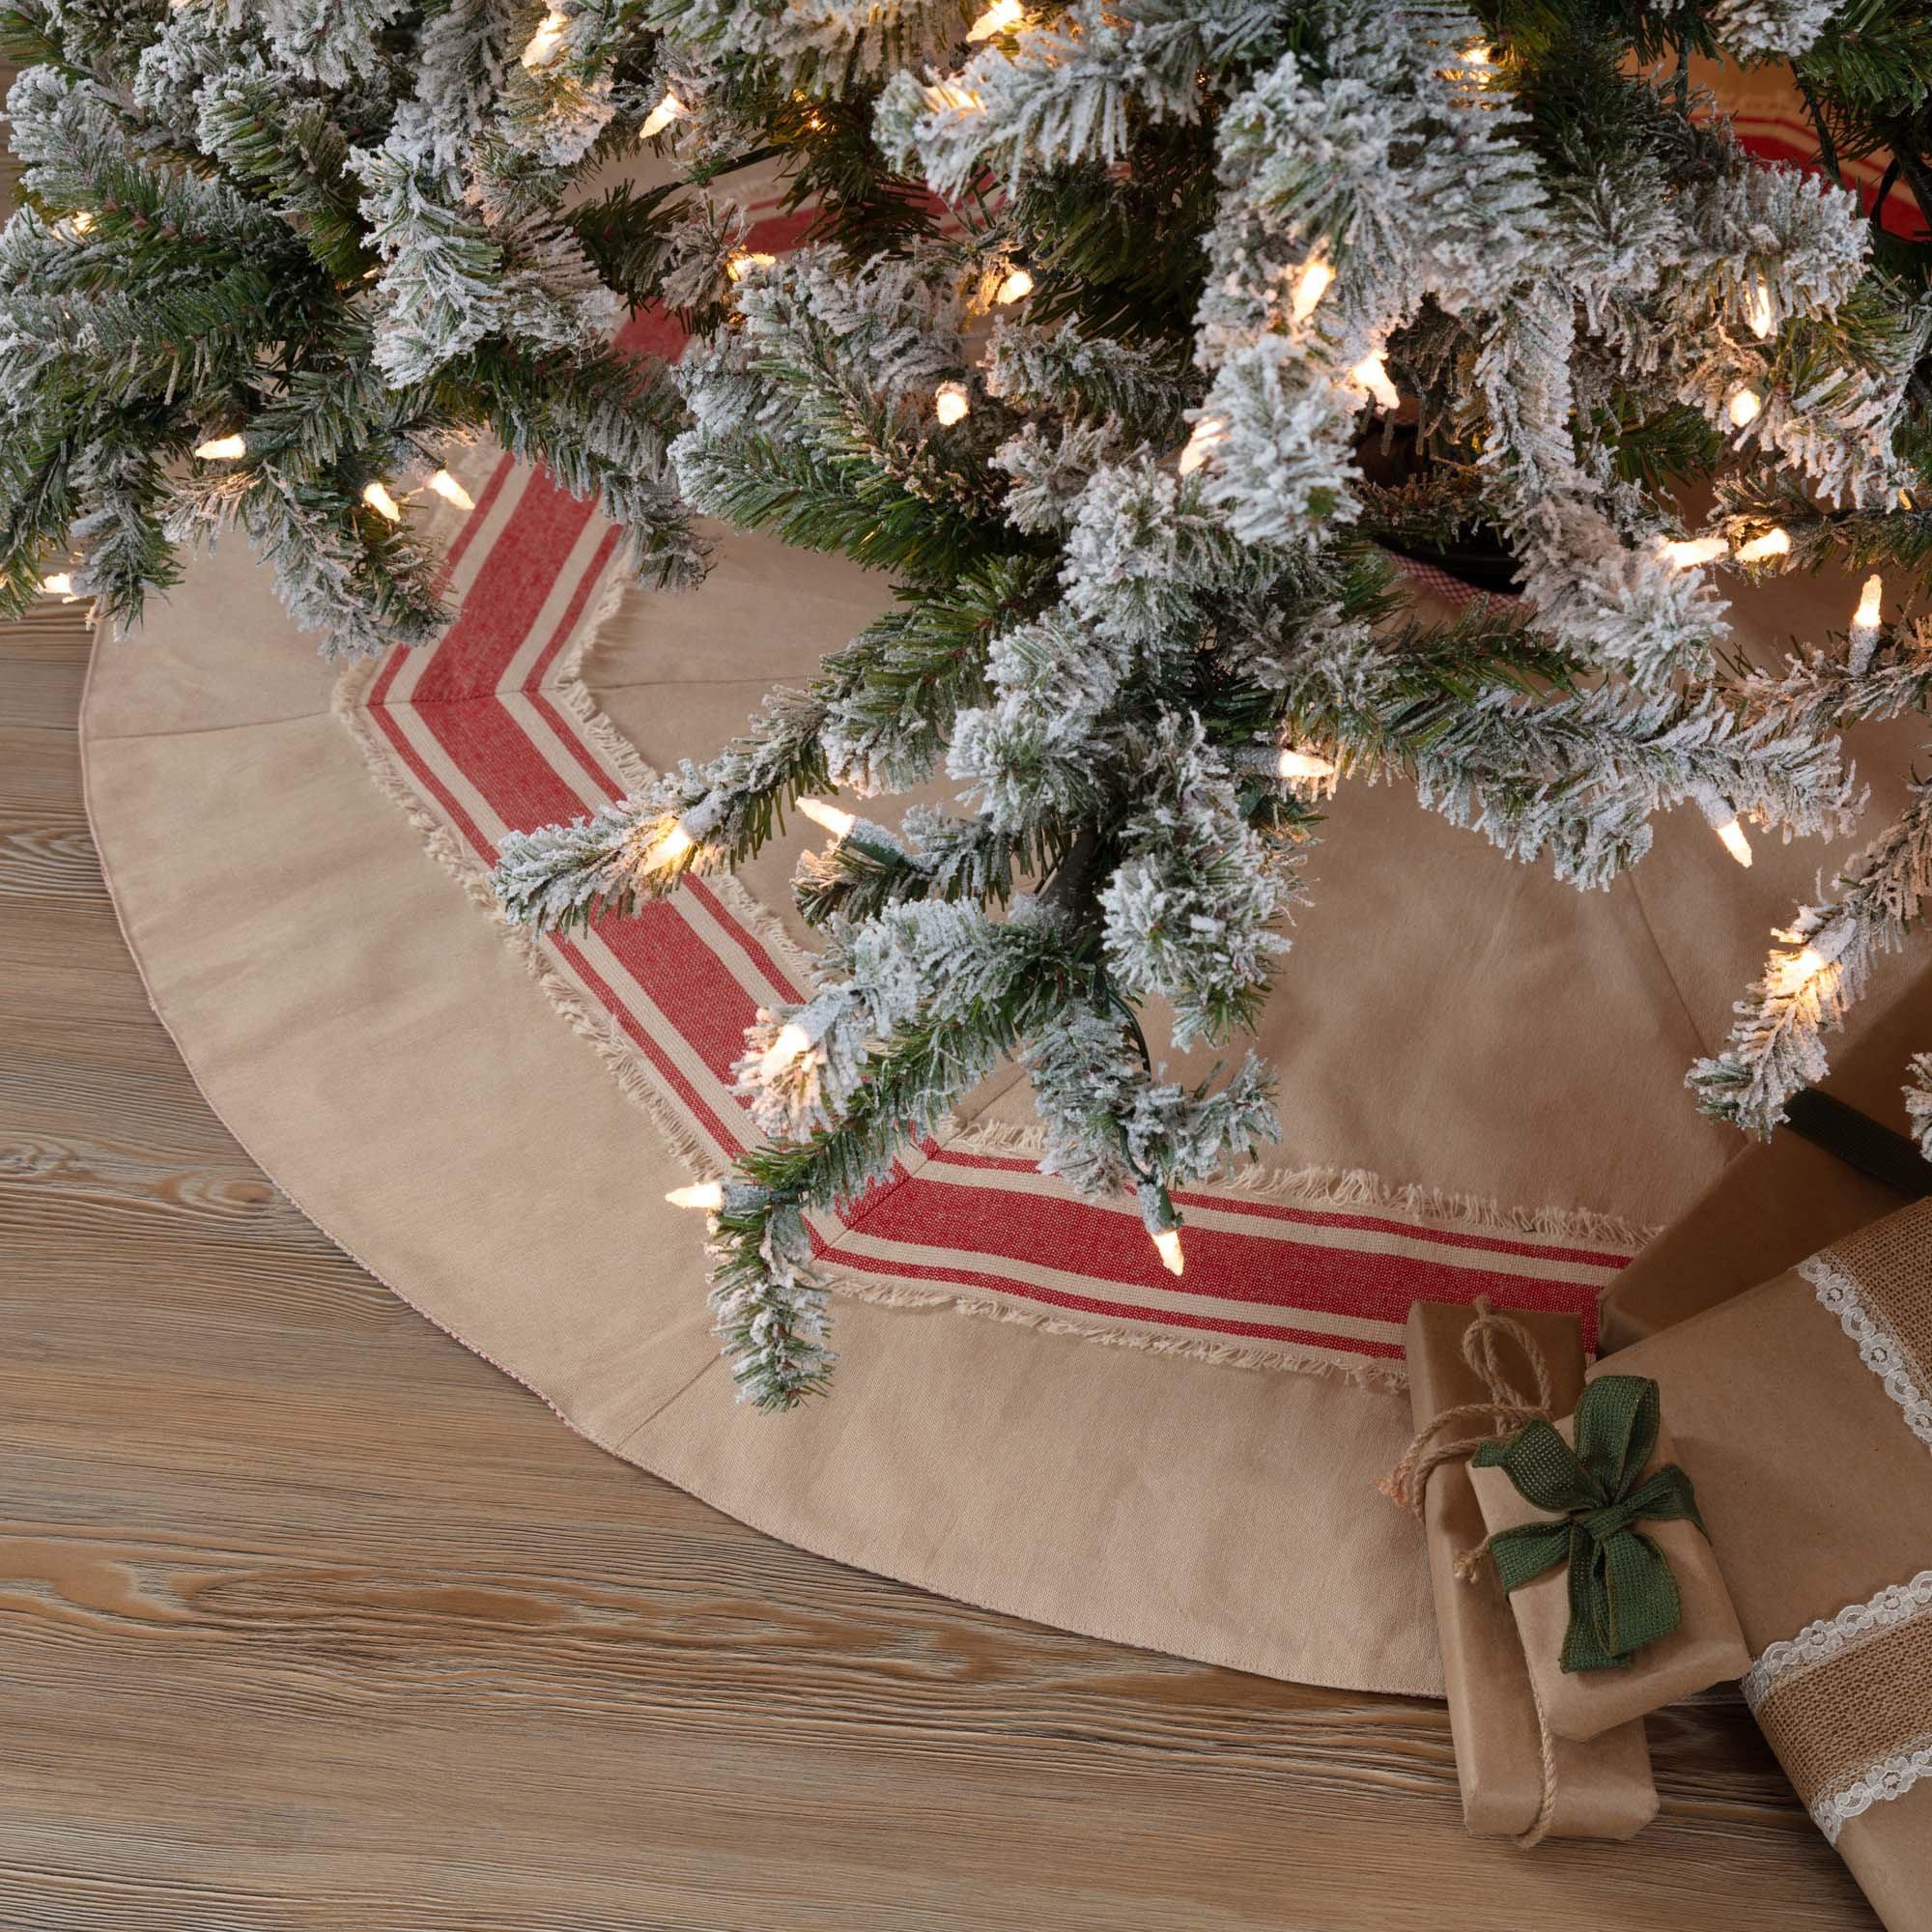 Piper Classics Farmhouse Red Stripe Tree Skirt, 48'' Diameter, Country Farmhouse Christmas and Holiday Seasonal Decor